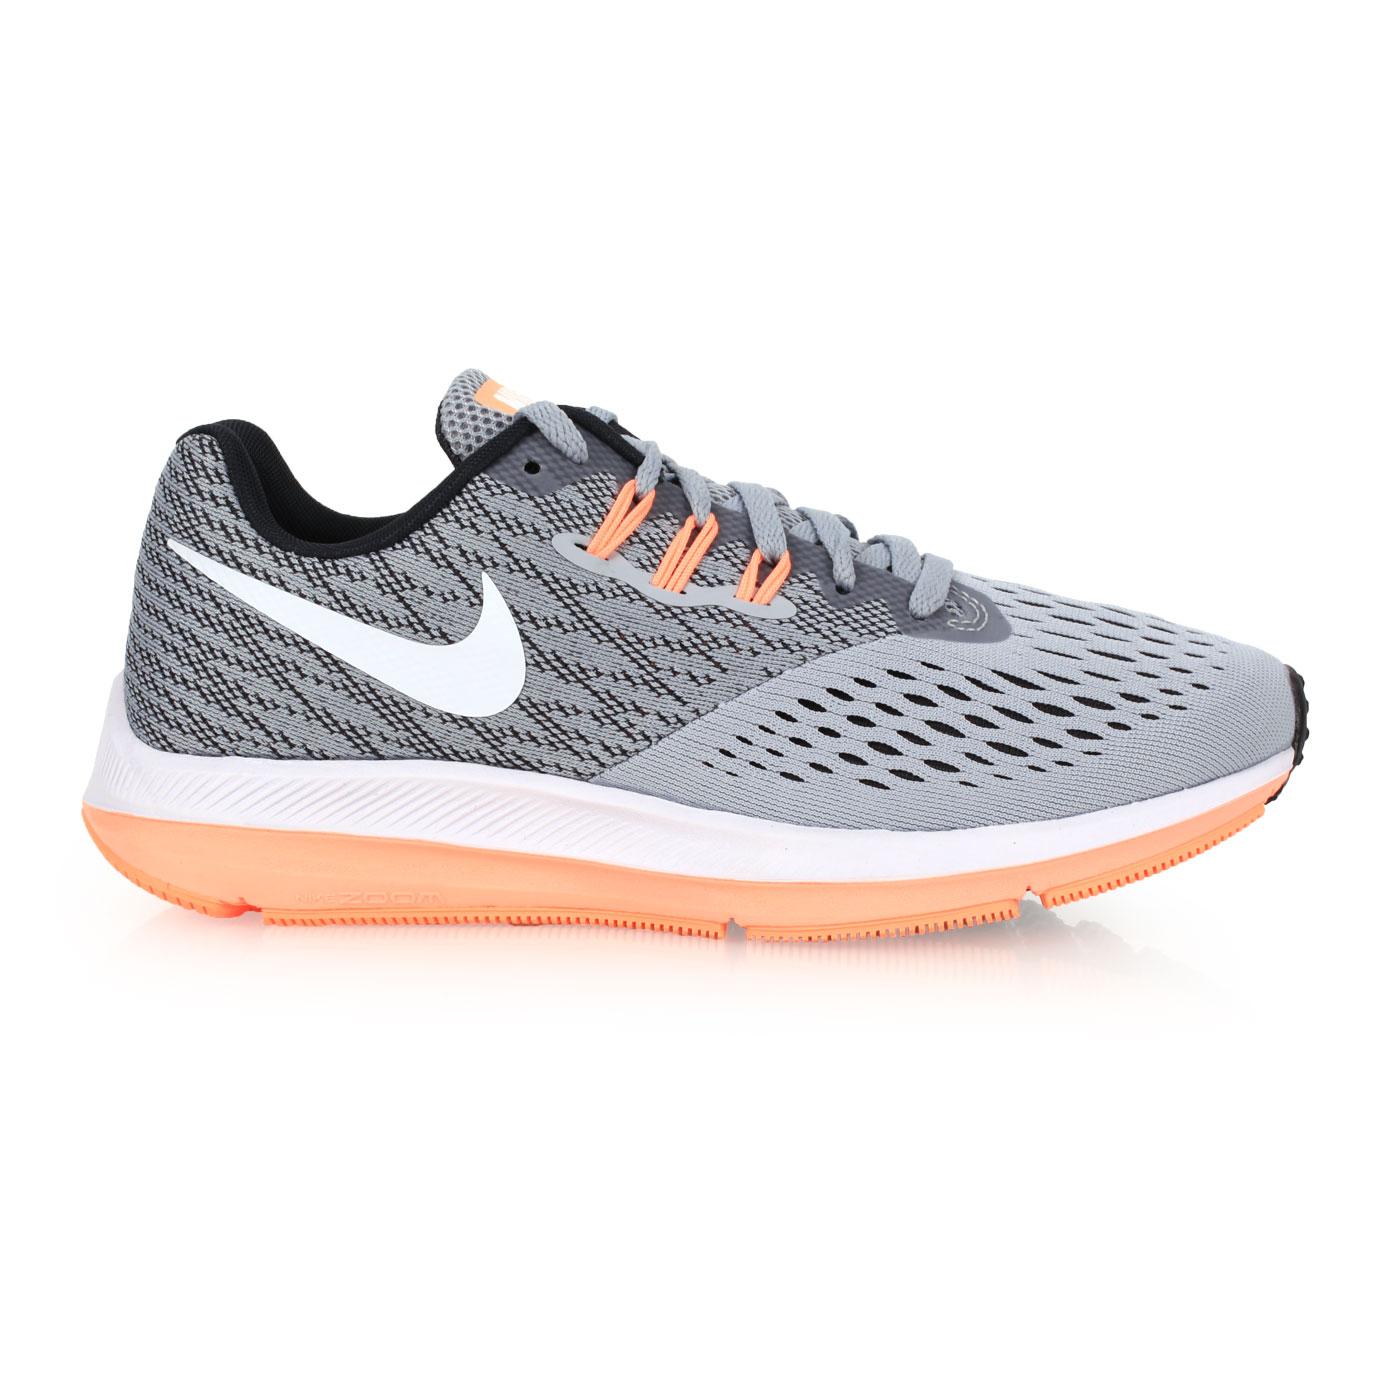 NIKE ZOOM WINFLO 4 女慢跑鞋 (免運 路跑 訓練【02016589】≡排汗專家≡